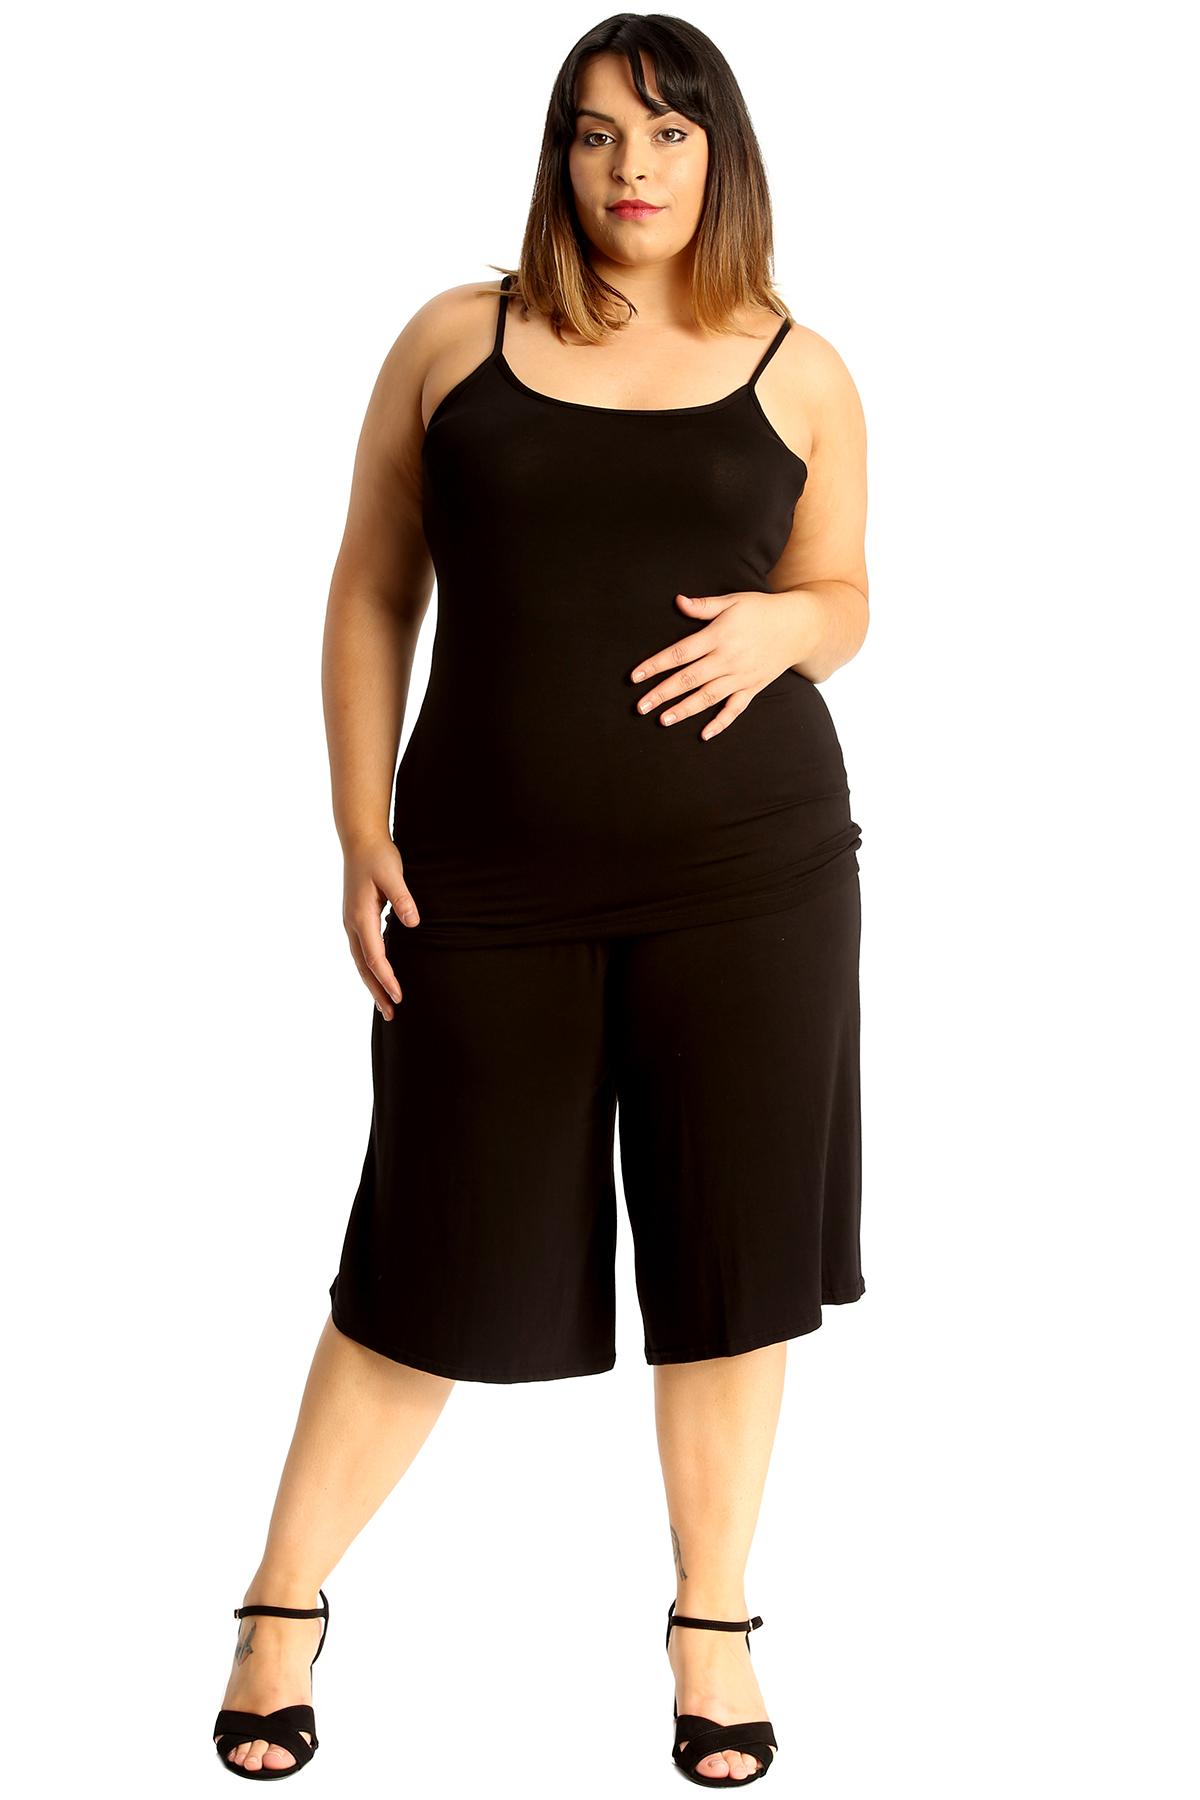 New-Womens-Plus-Size-Culottes-Ladies-Plain-Shorts-Palazzo-Elastic-Pants-Summer thumbnail 14